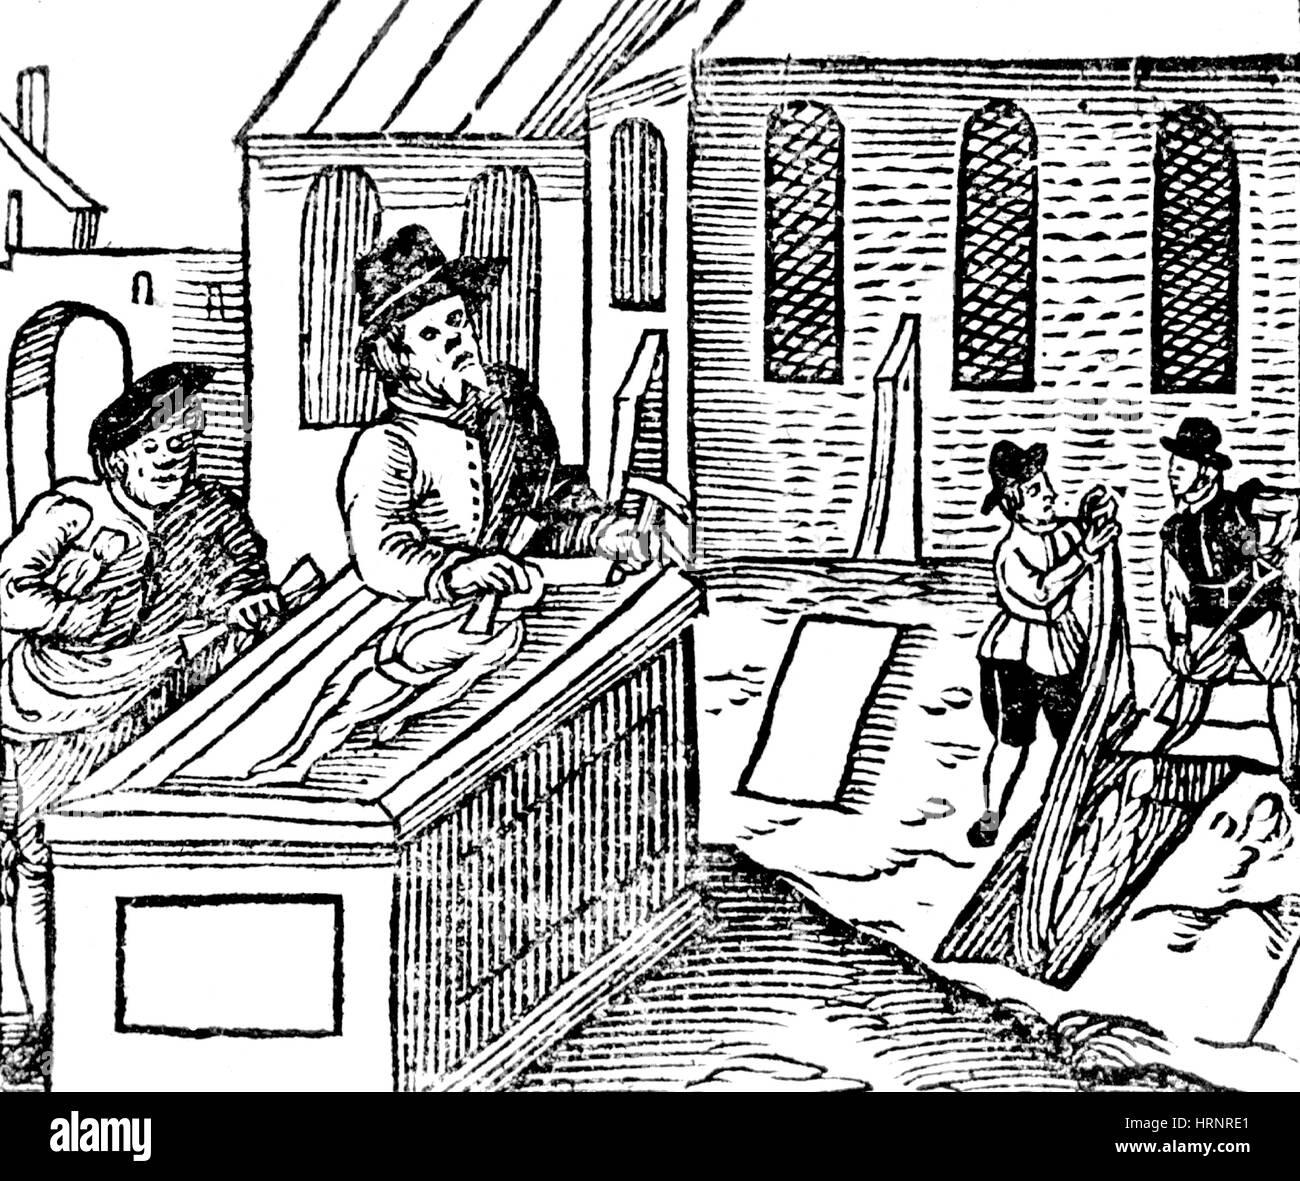 Body Snatching, 1628 Stock Photo - Alamy